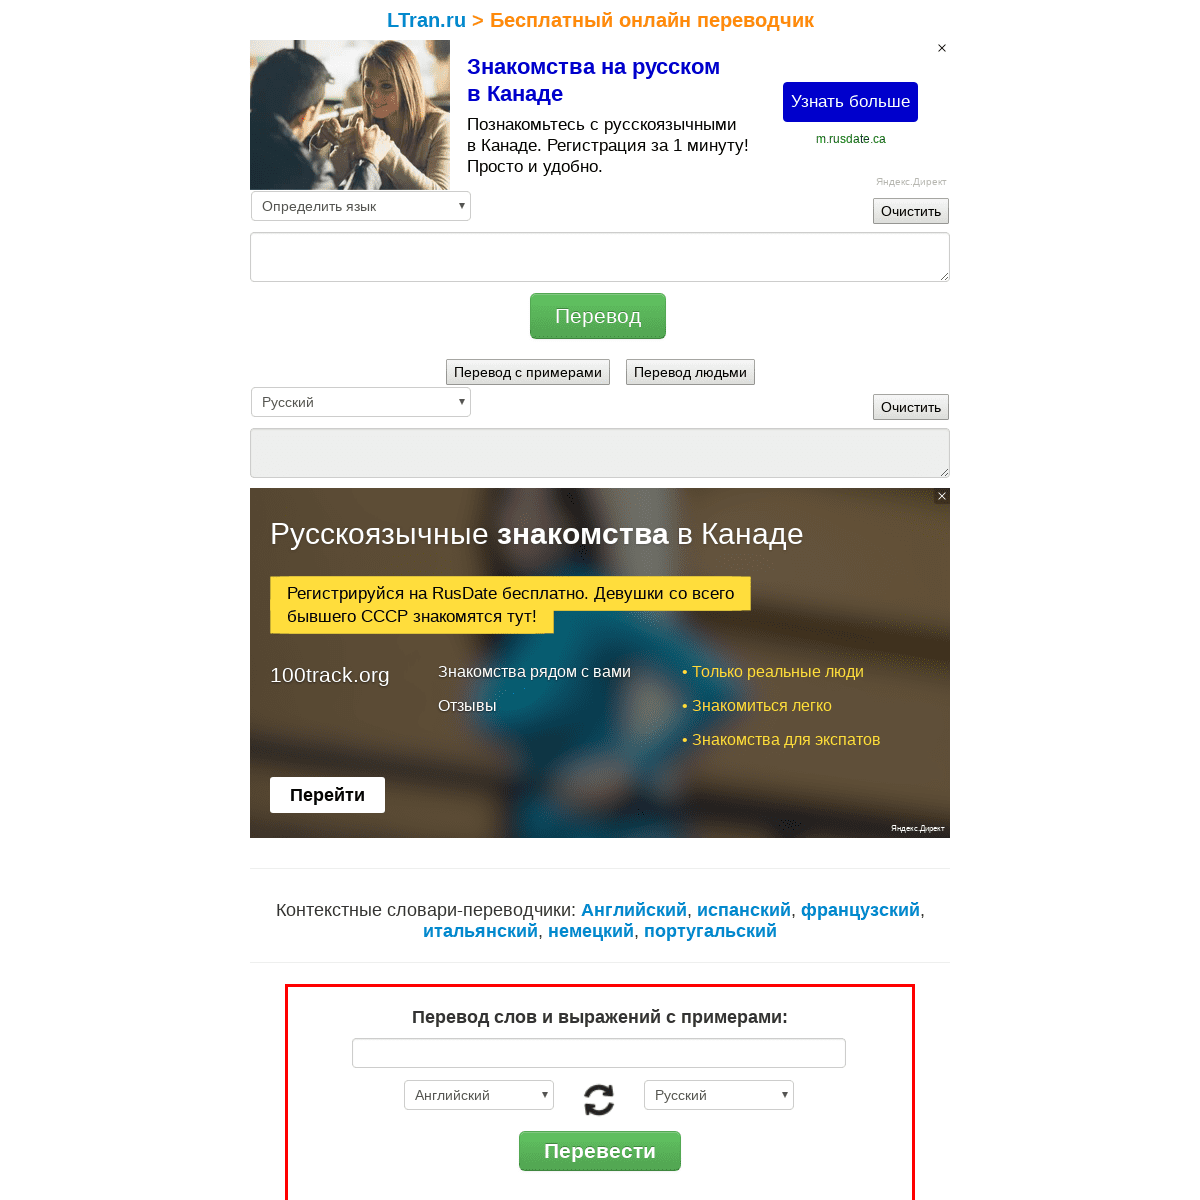 ArchiveBay.com - ltran.ru - Онлайн-переводчик - LTran.ru